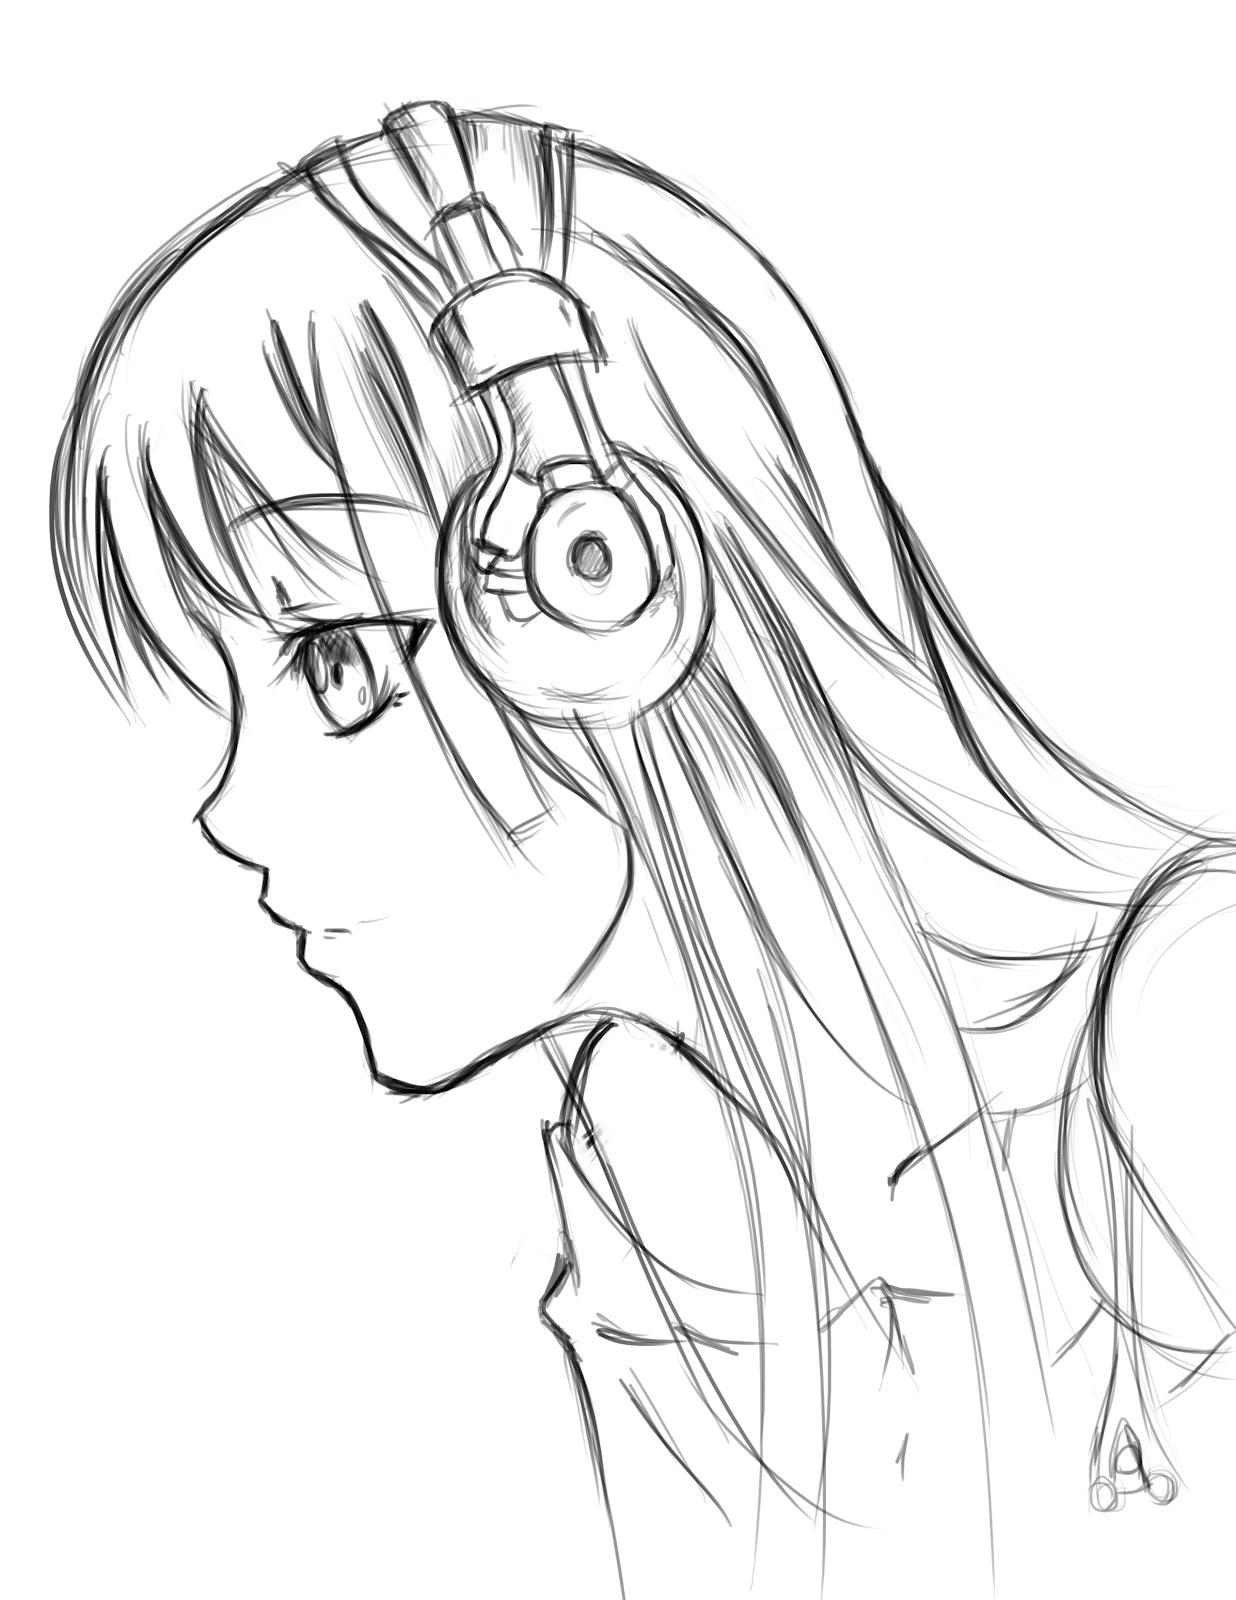 1236x1600 Animartic More Sketches